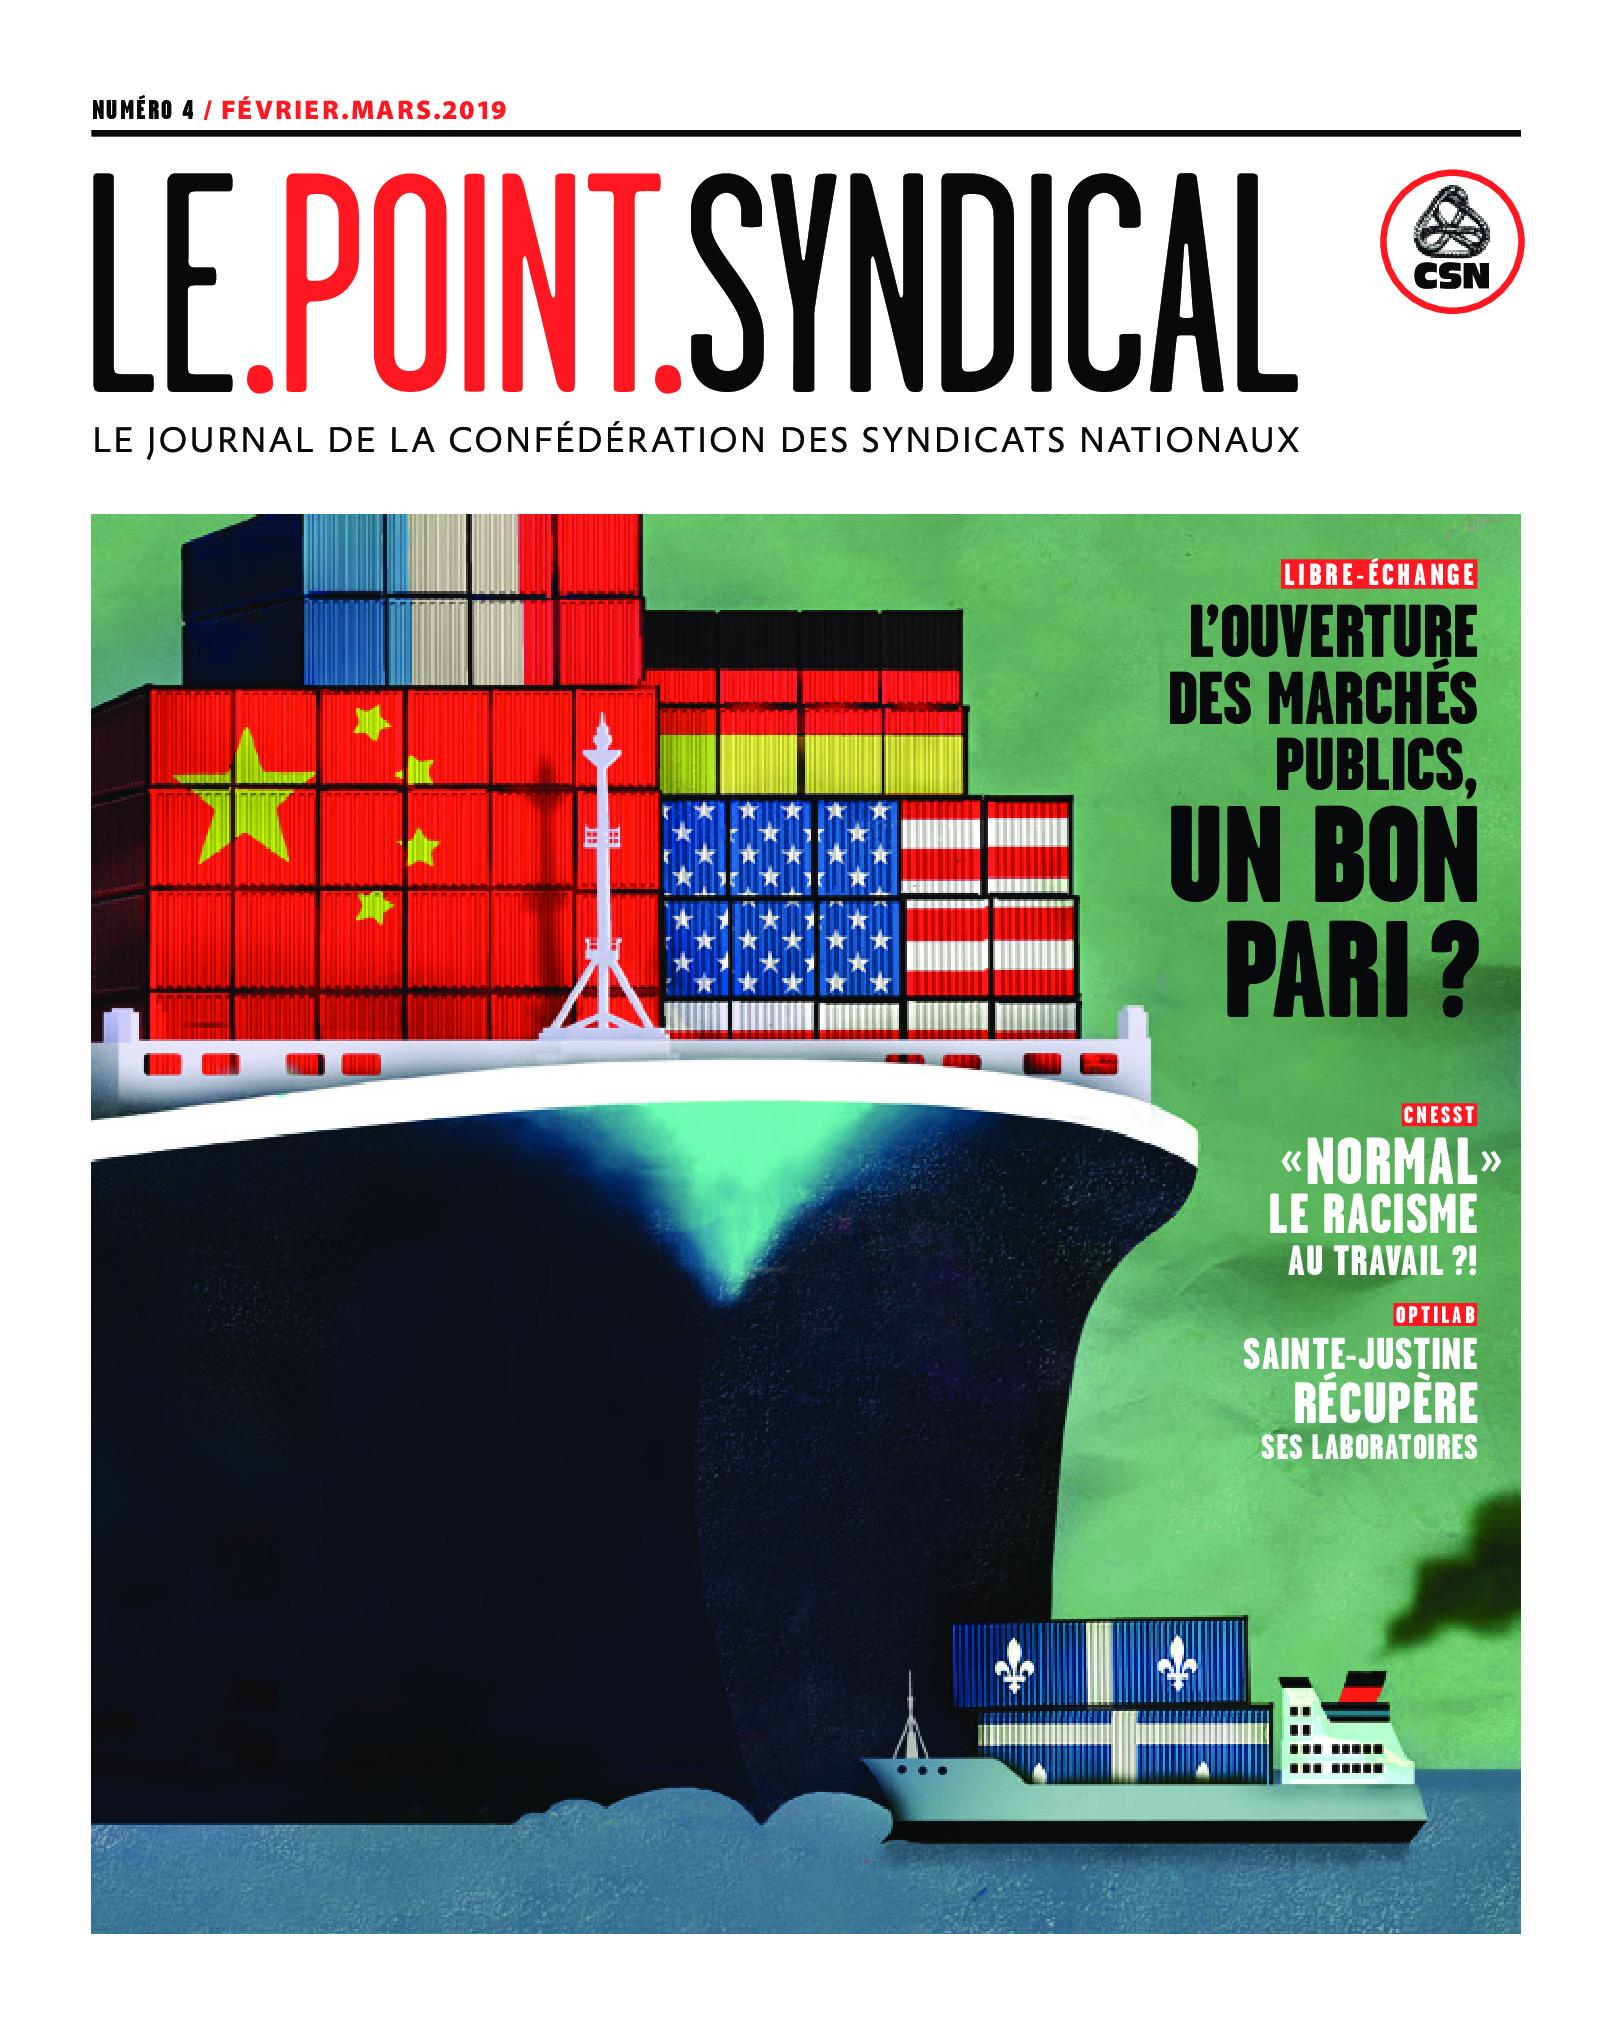 Le Point Syndical Numéro 4